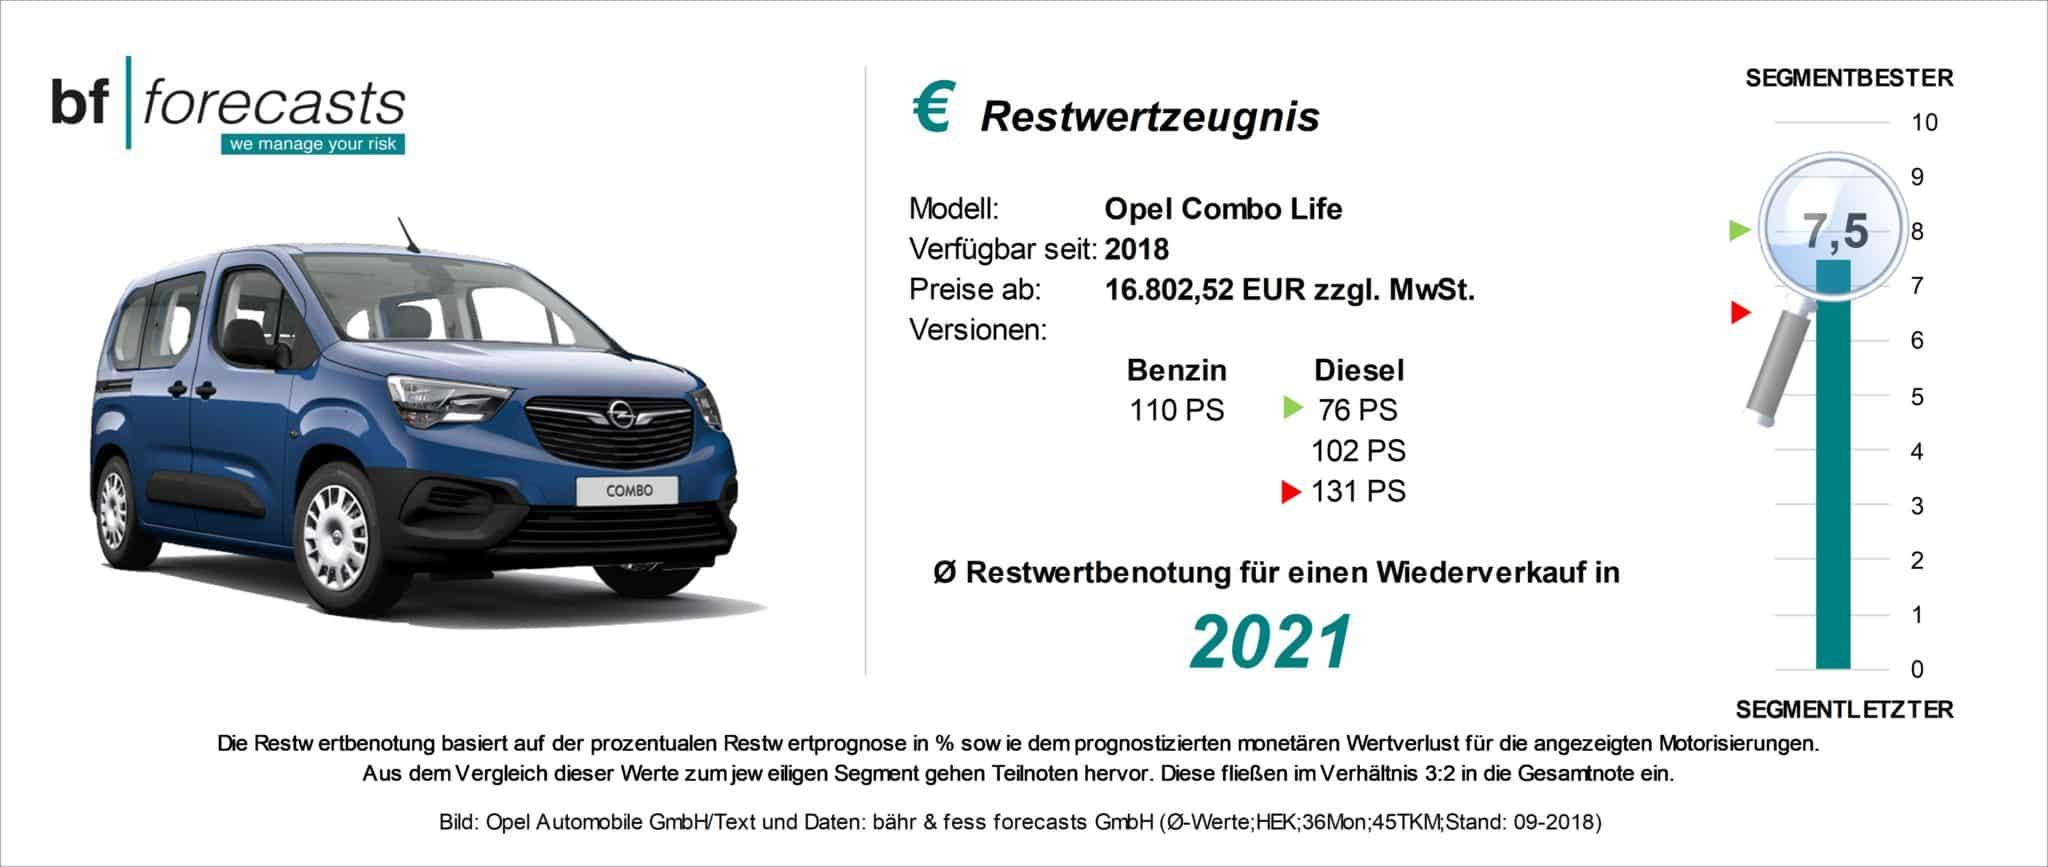 Restwertzeugnis Opel Combo